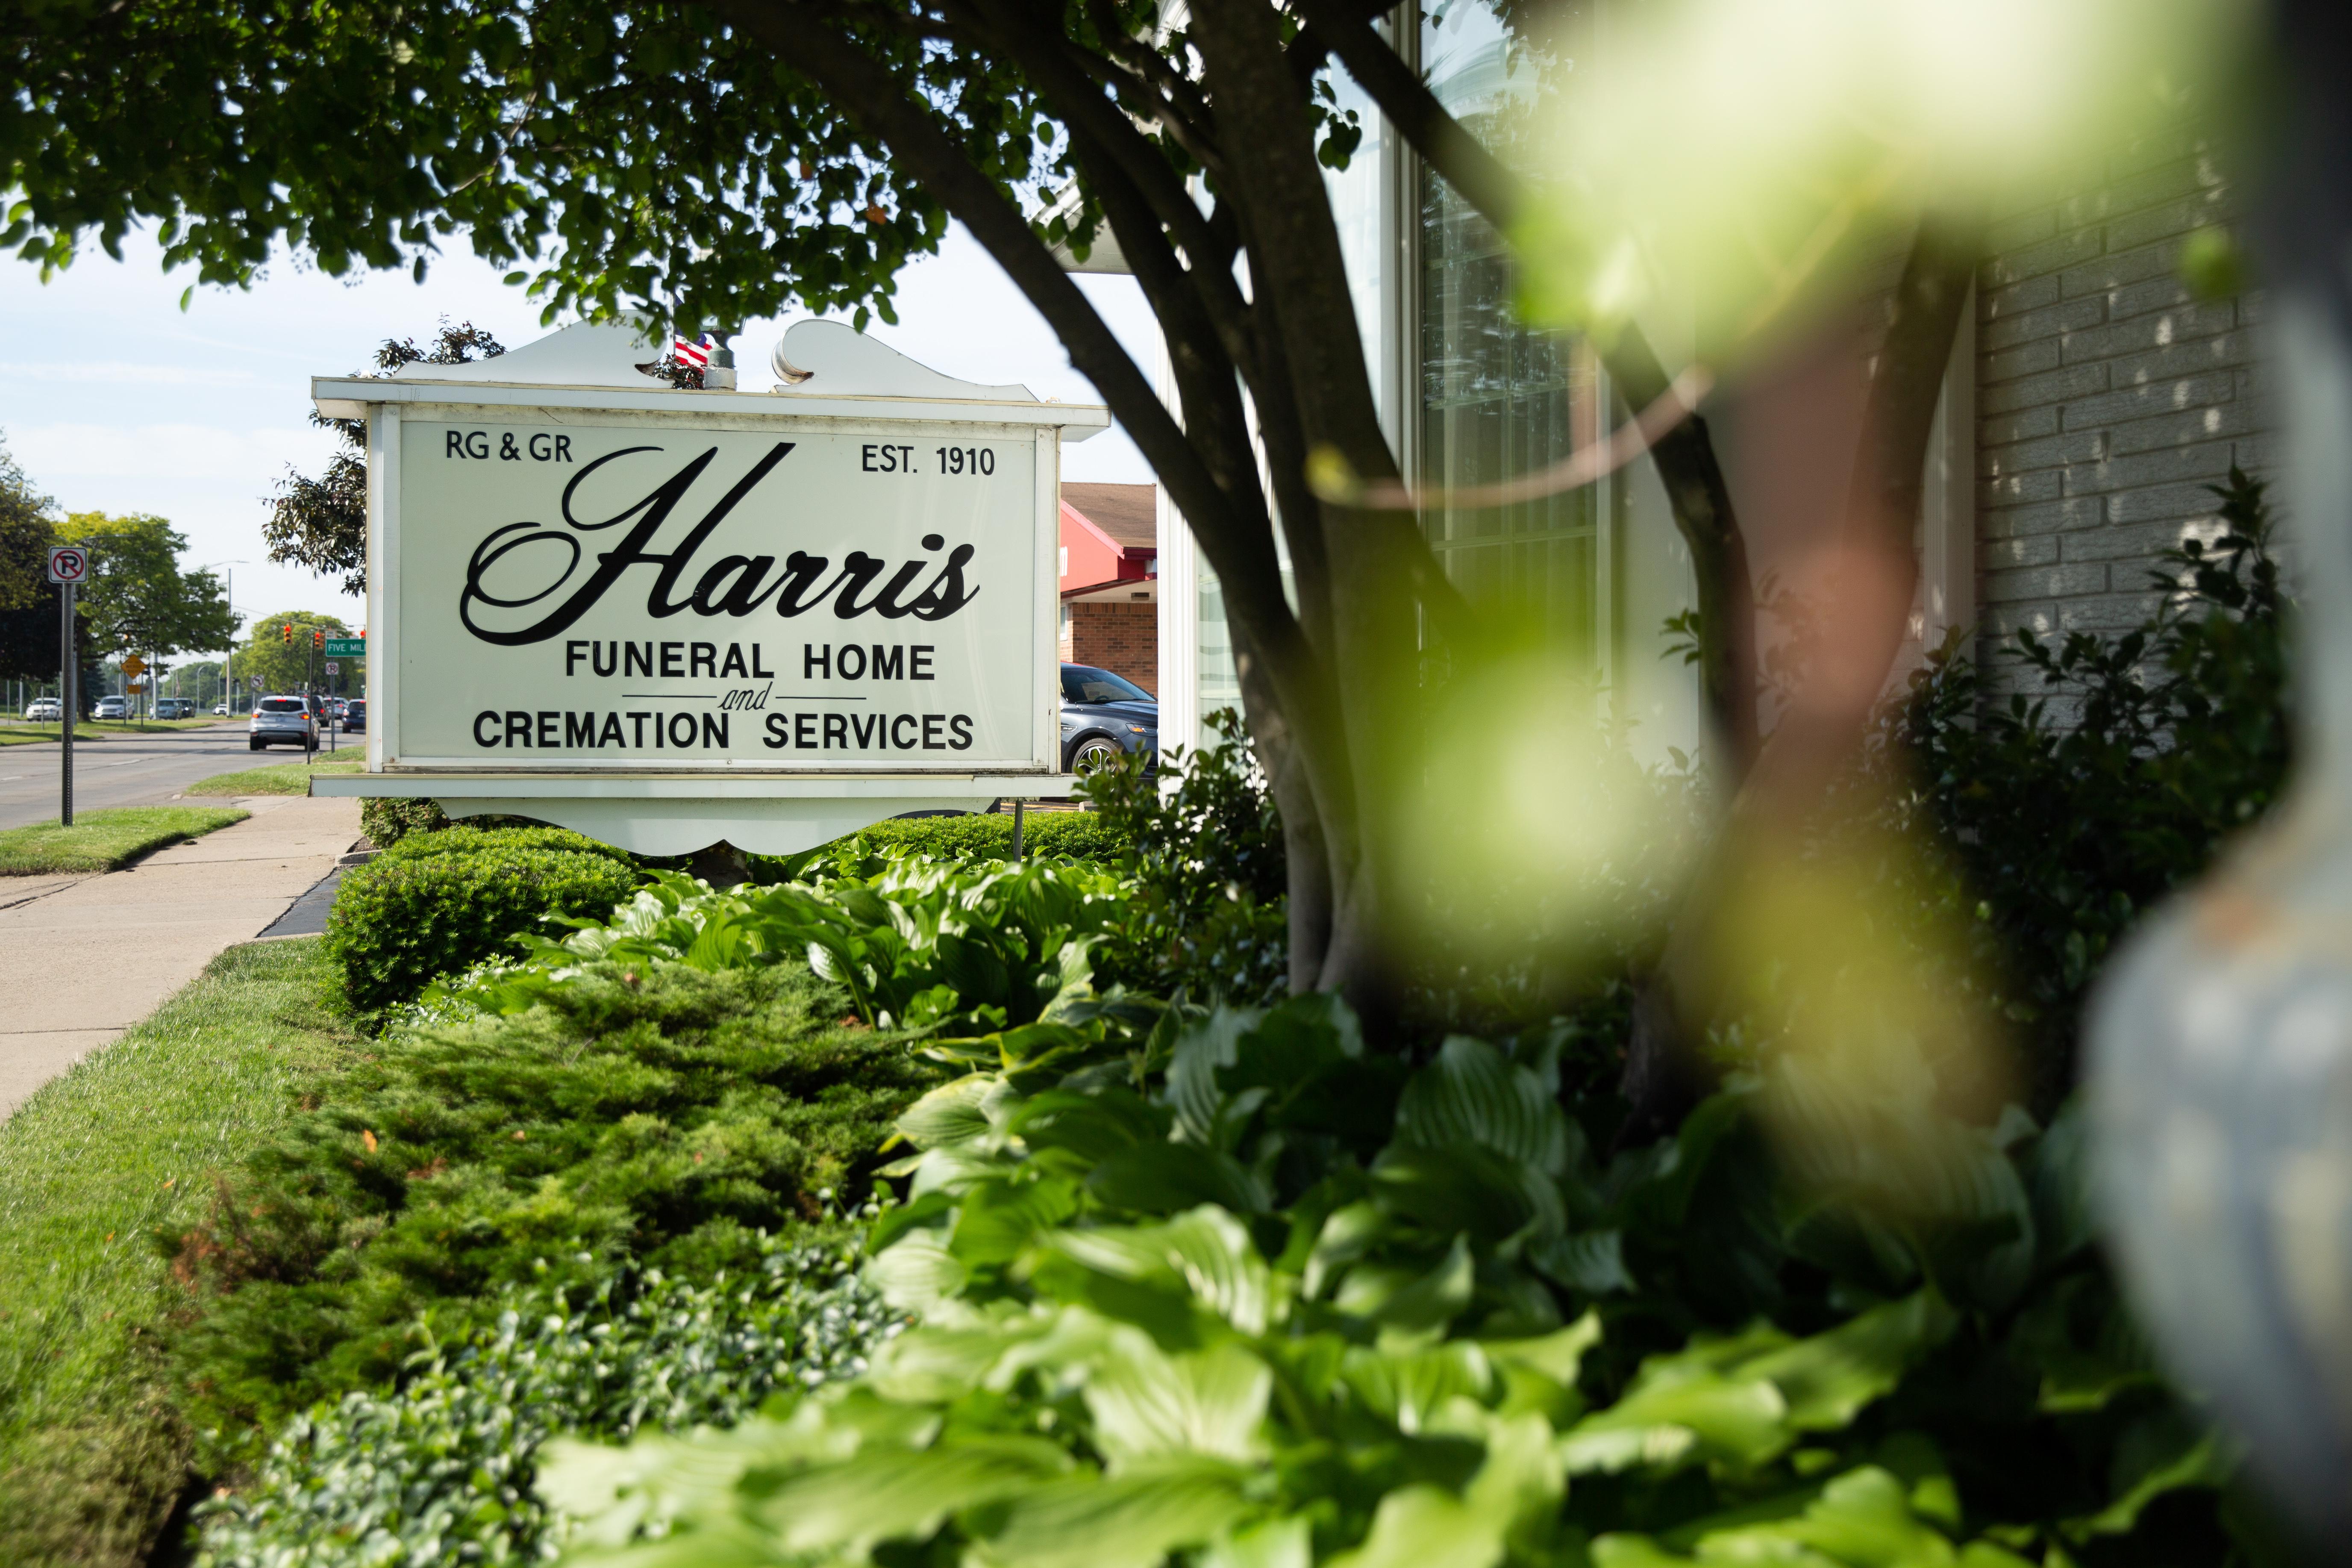 R.G. & G.R. Harris Funeral Homes in Garden City, Michigan. (Alliance Defending Freedom)